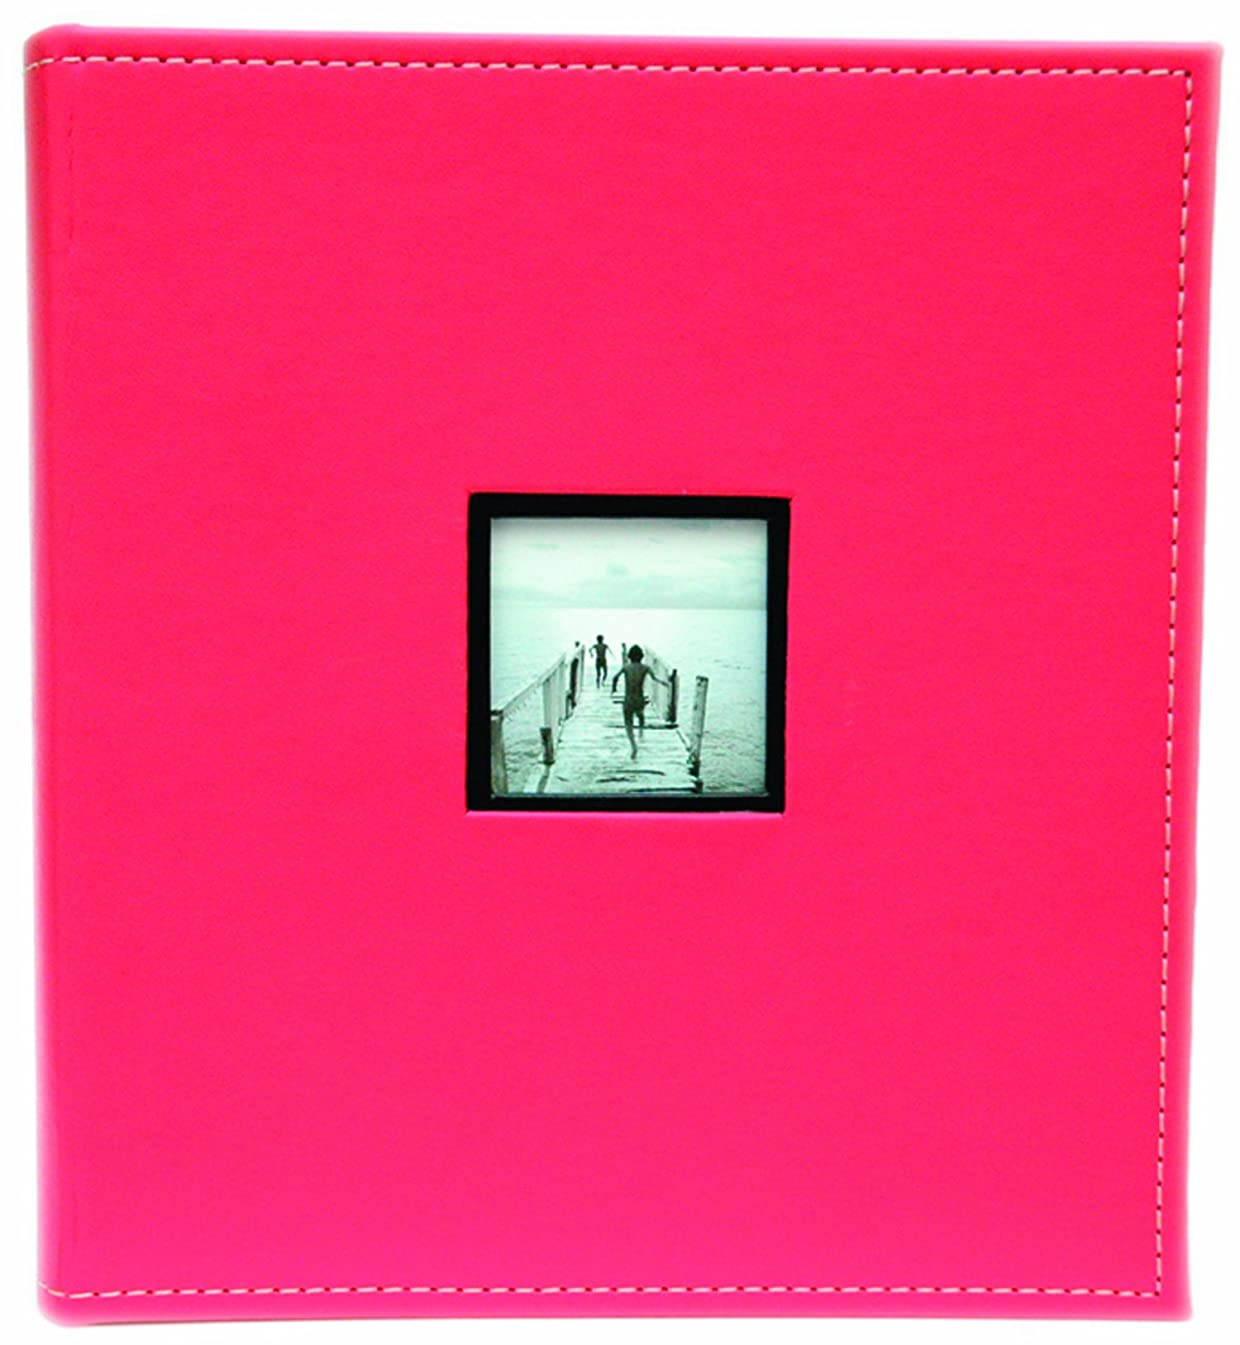 Coral Coast Prestige Slip in 200 Photo Album Pink 4x6